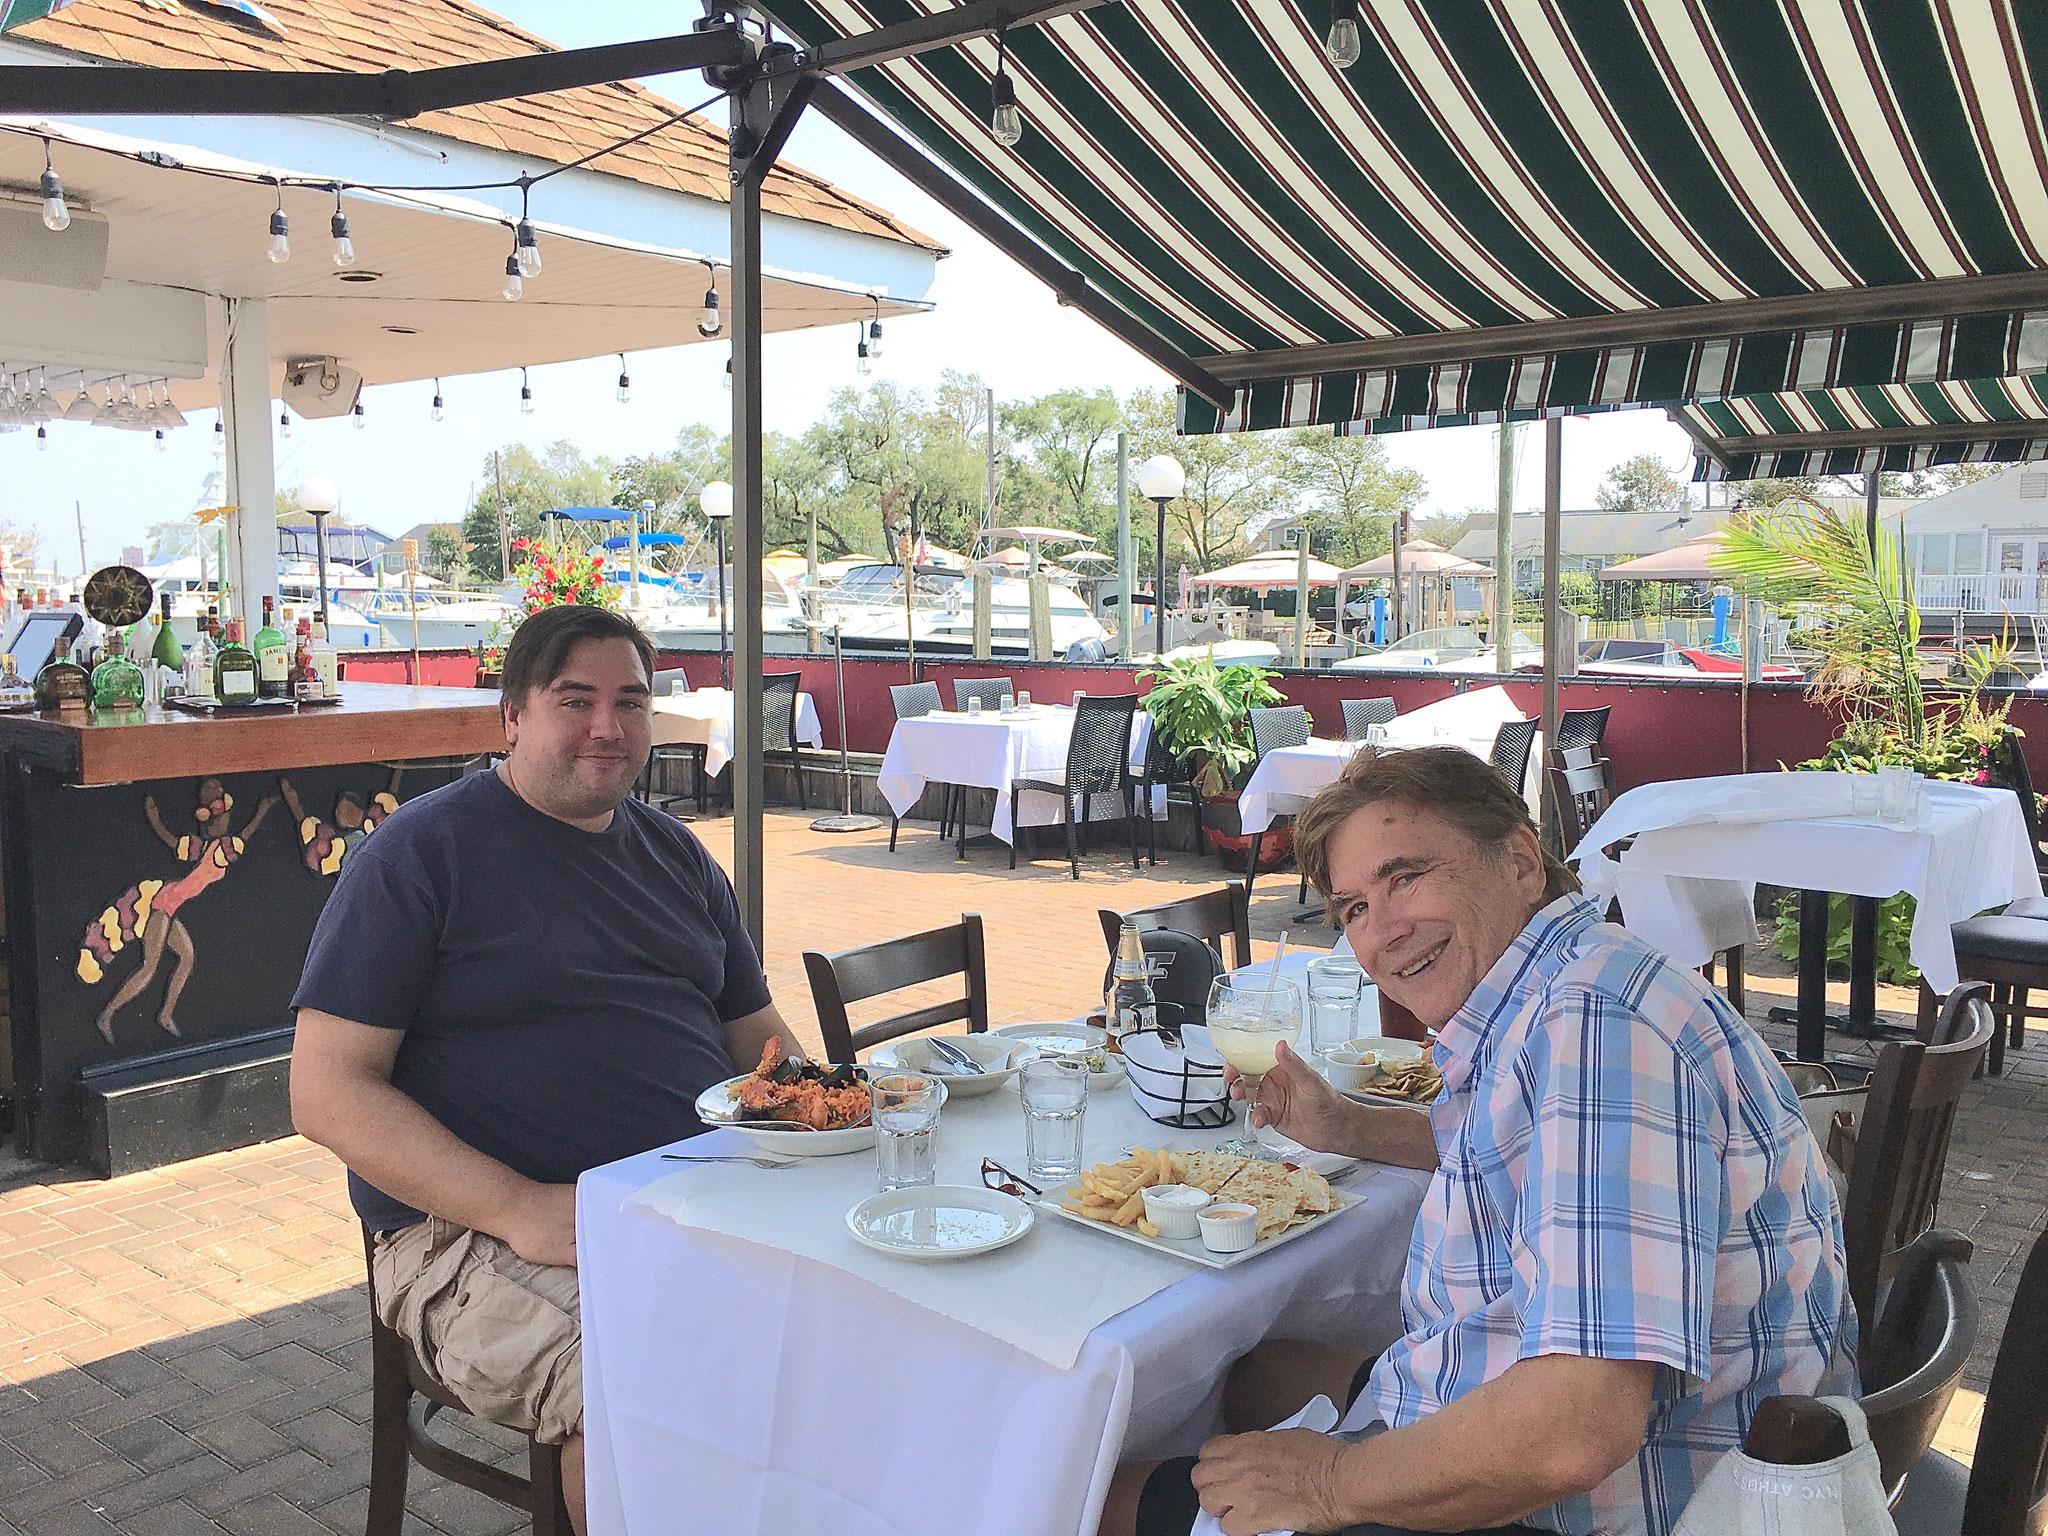 Greg & John, dining after swimming at Jones Beach, 8-2020